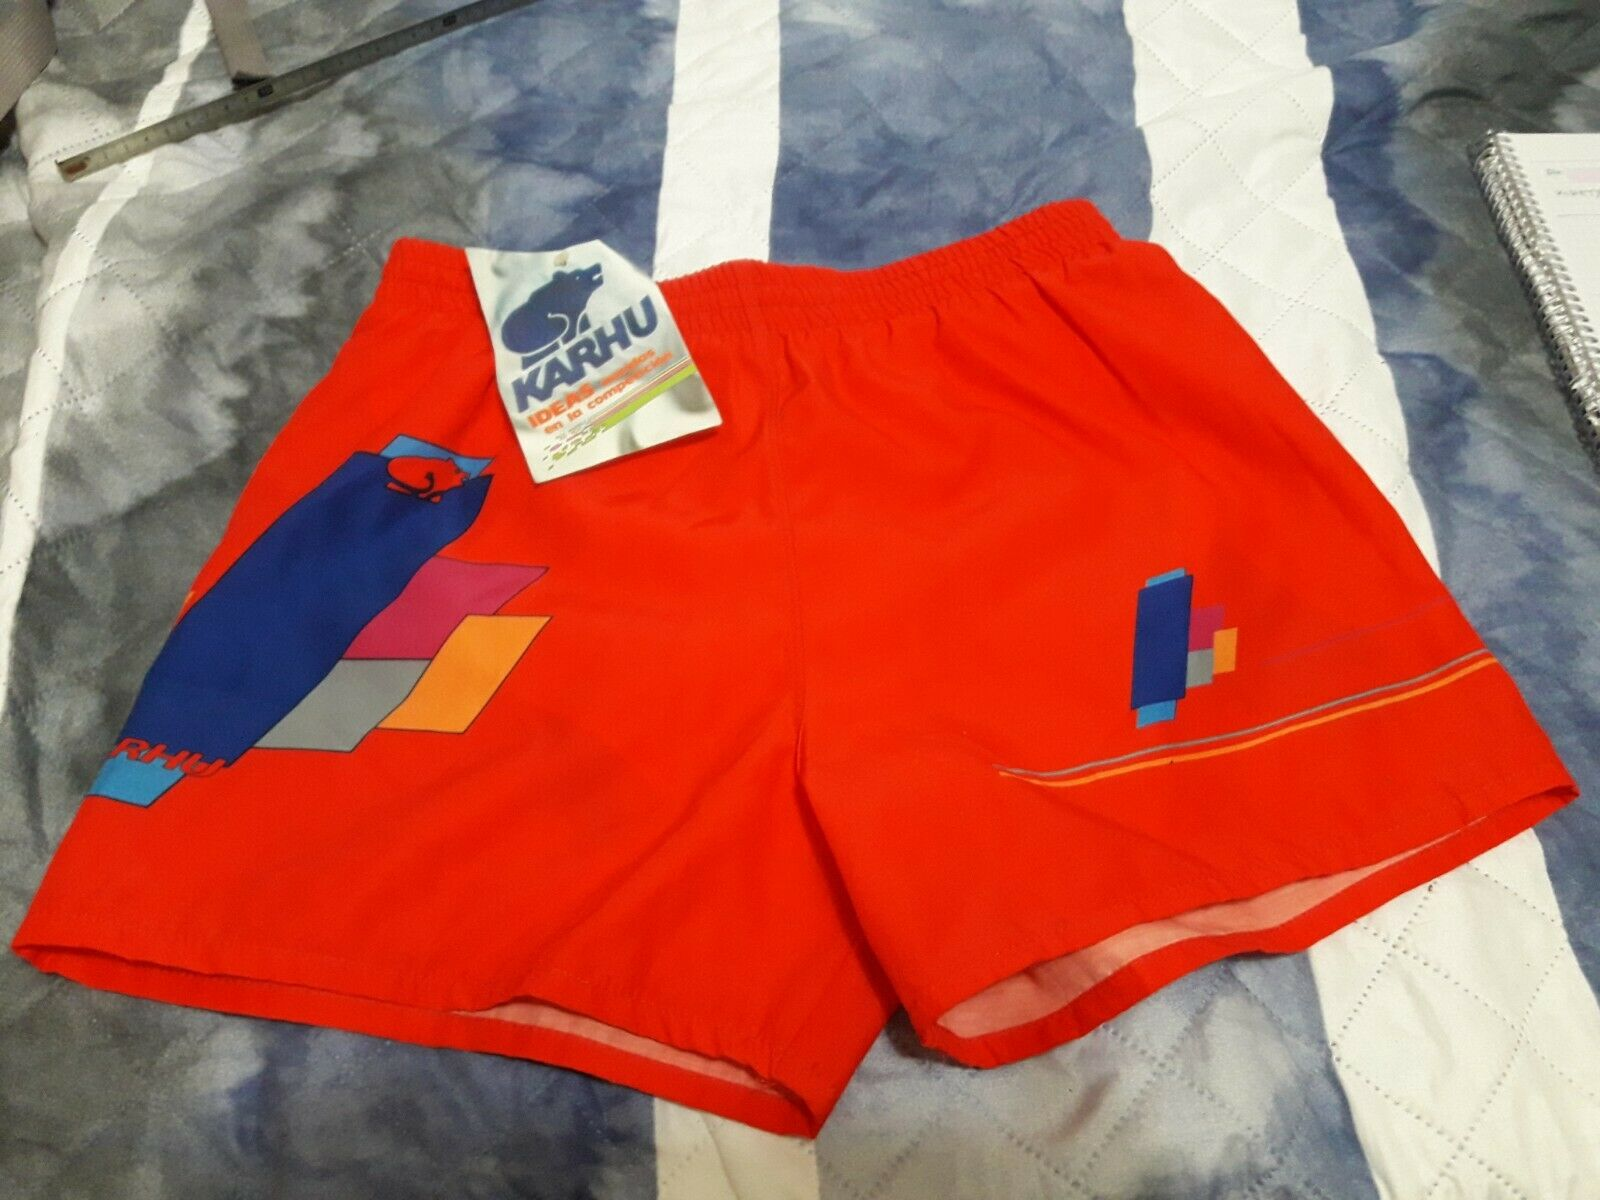 Vintage karhu kinetyc 80s bathing suit rare short sport new-show original title